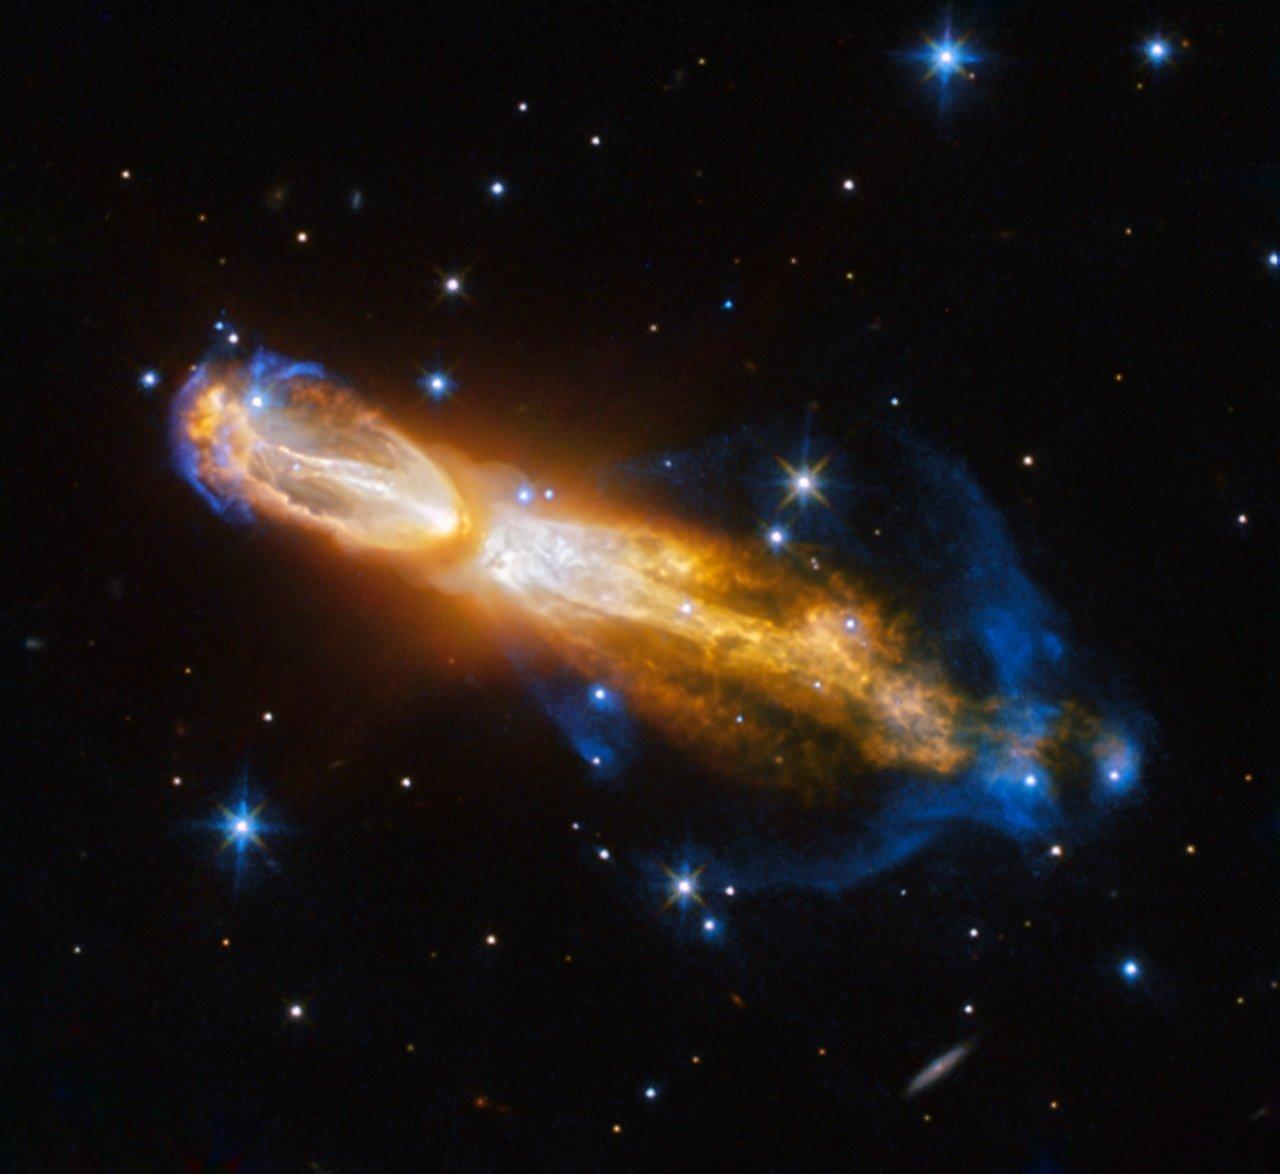 La muerte de una estrella de baja masa en la nebulosa OH 231.8+04